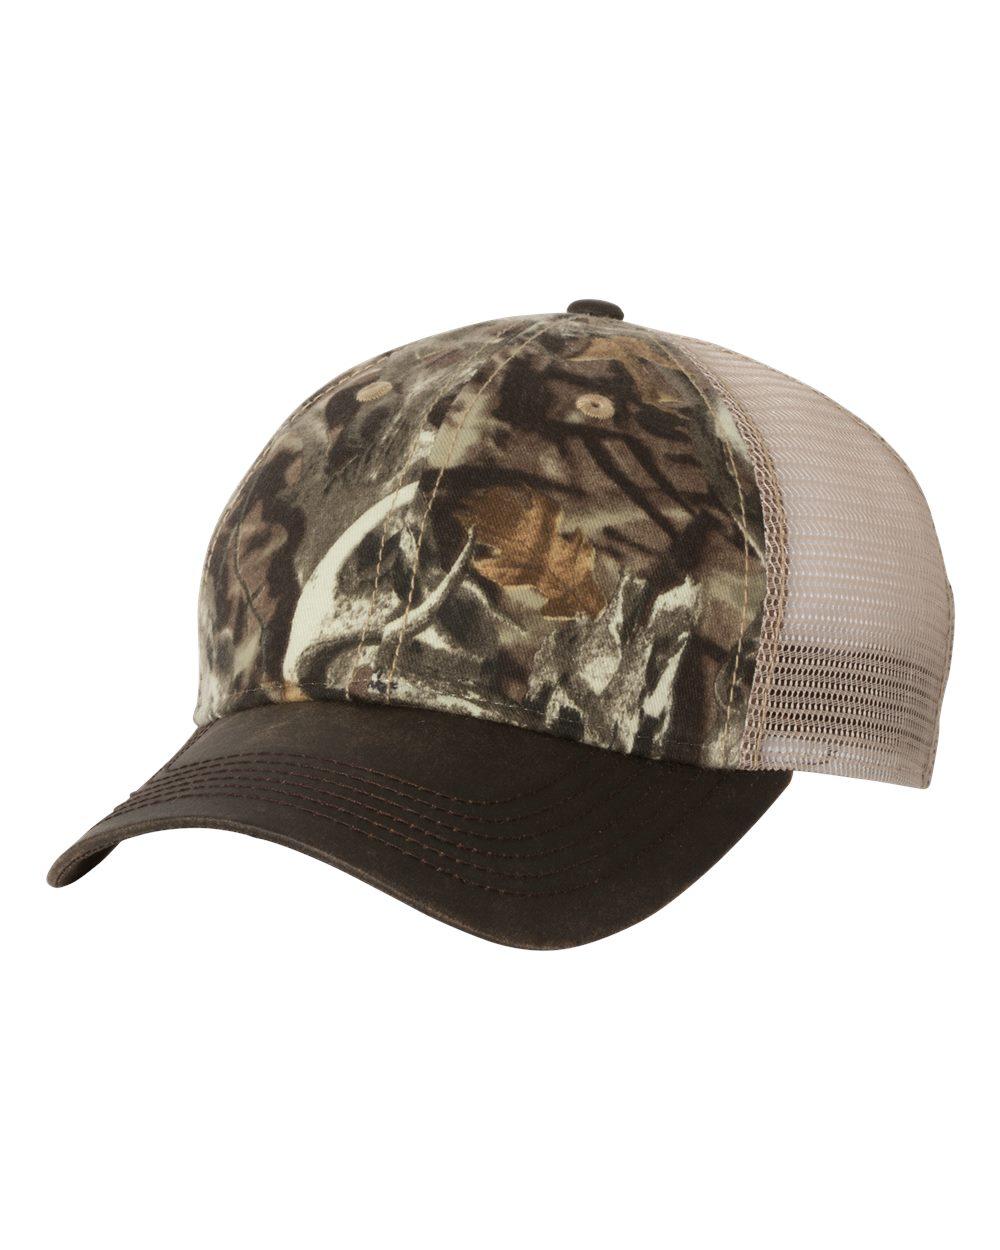 DRI DUCK 3003 - Meshback Field Cap